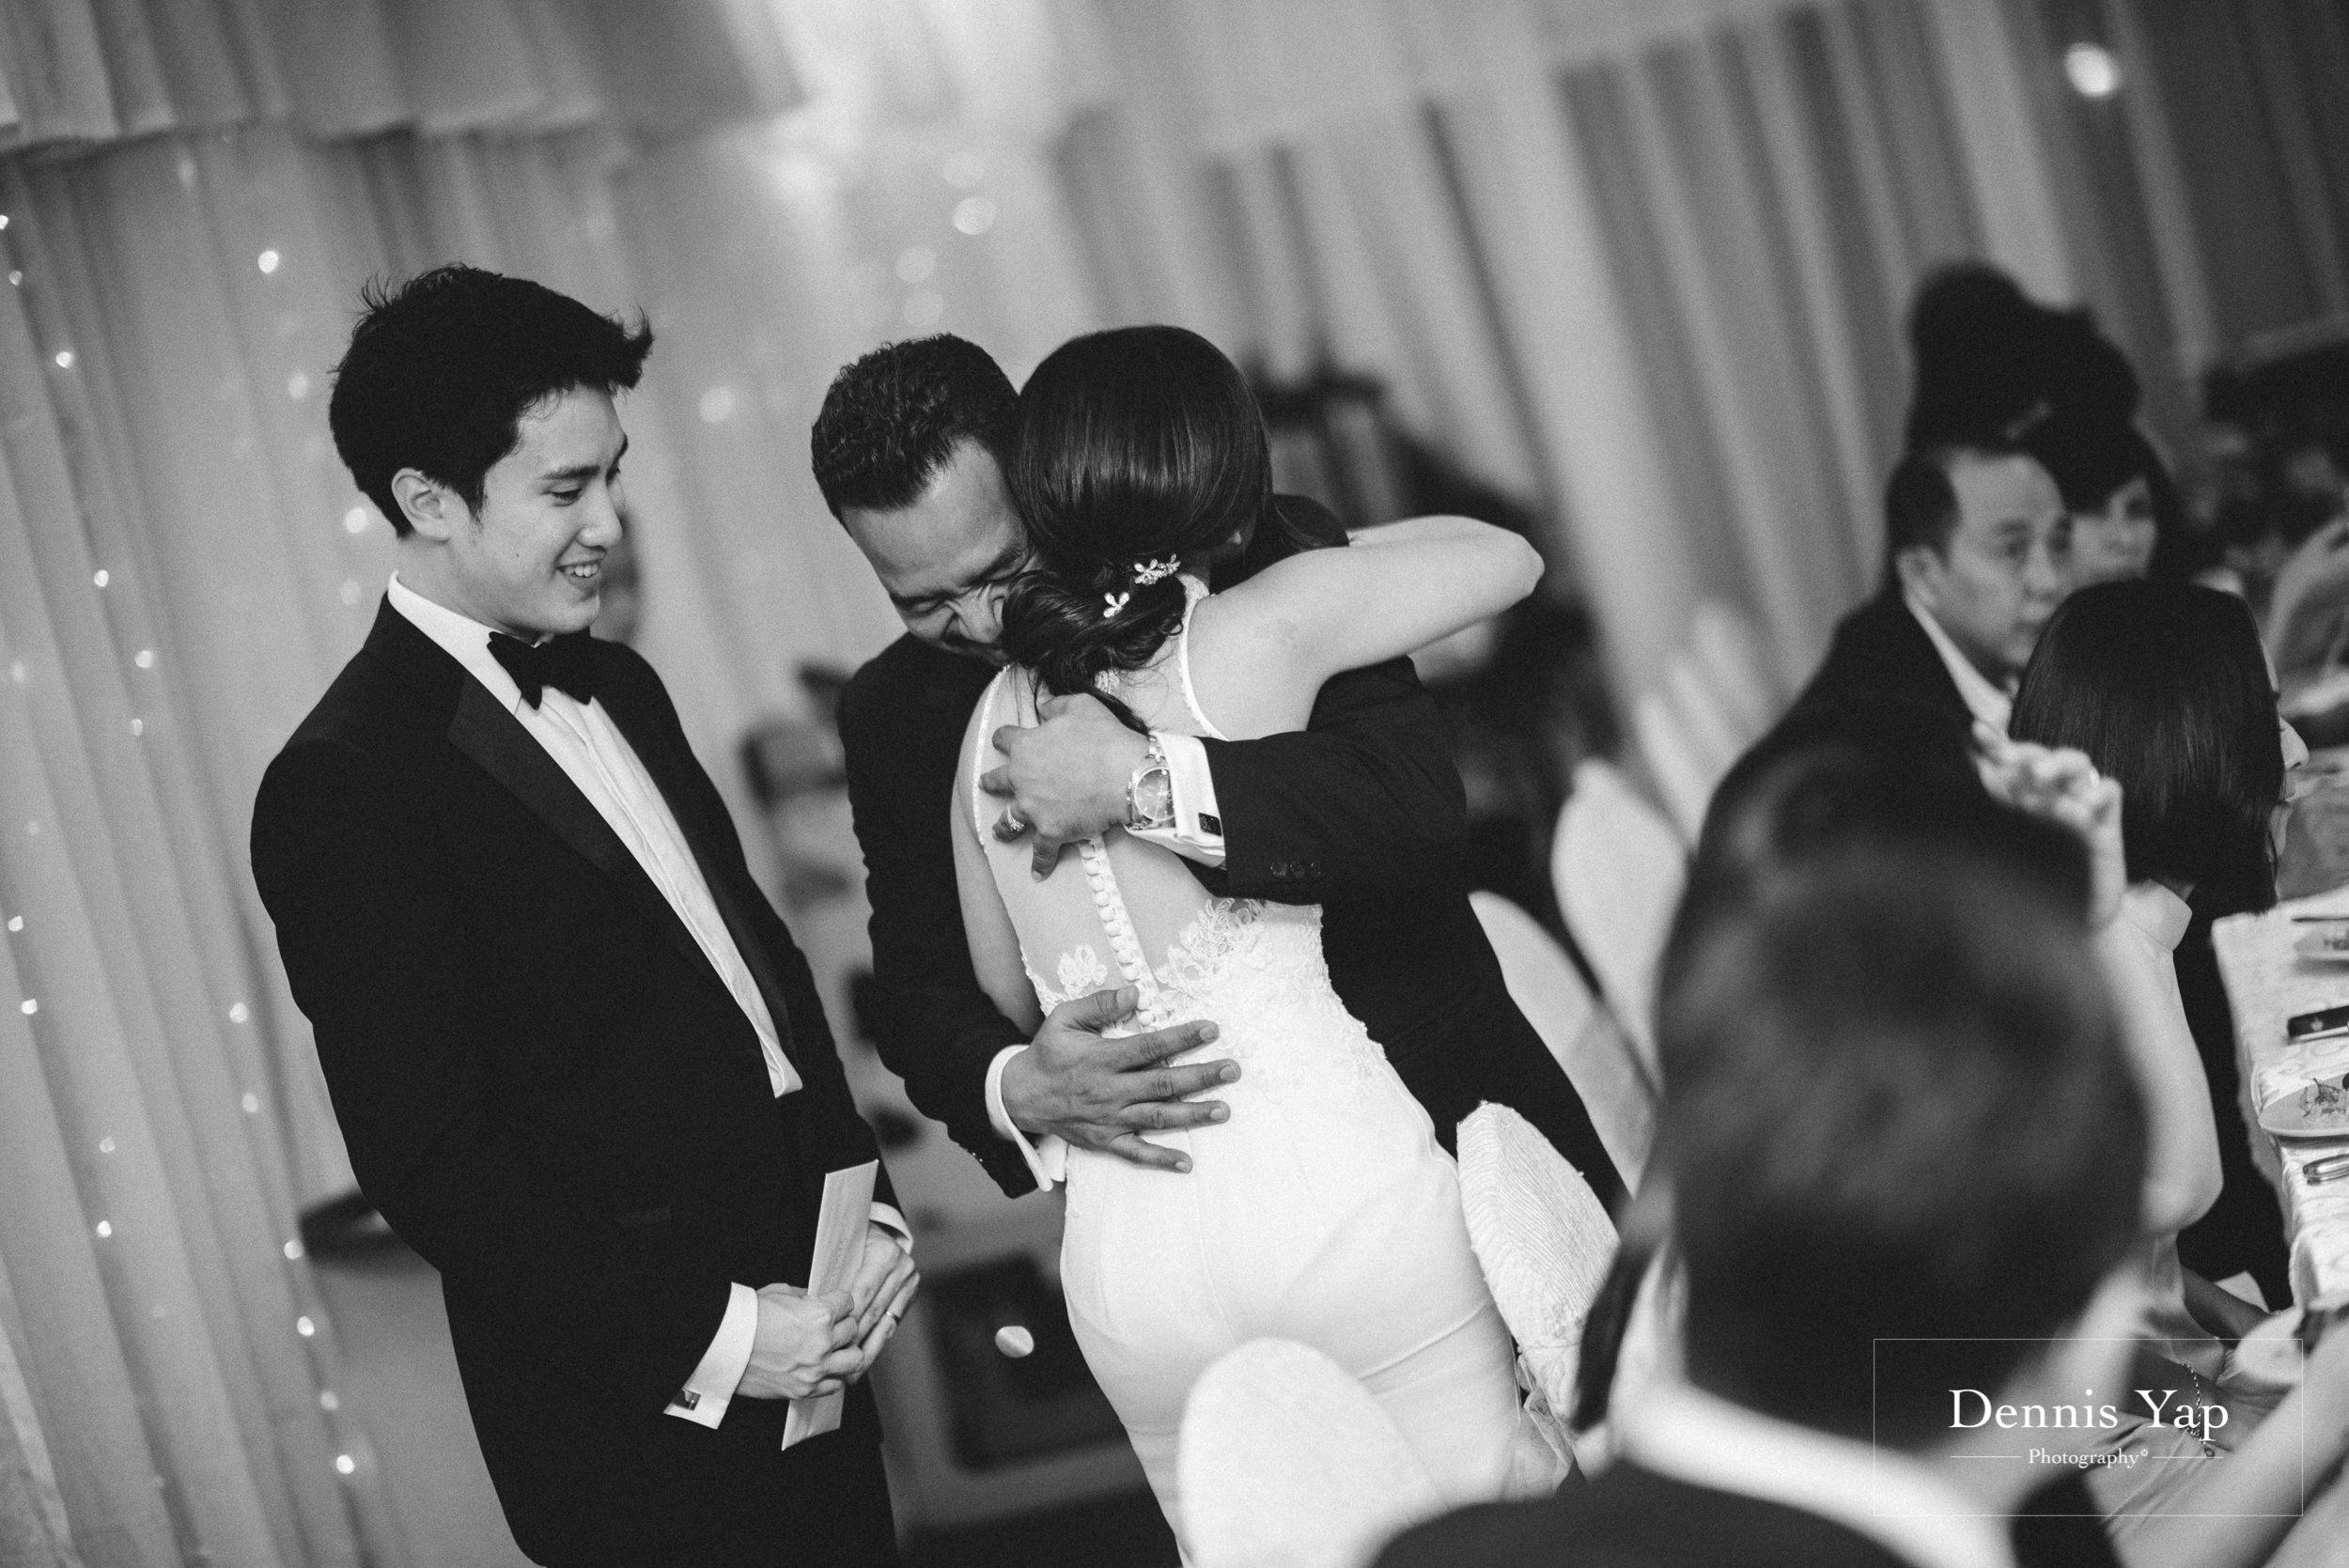 shalini yelitte wedding dinner rasa sayang resort penang dennis yap photography malaysia top wedding photographer beloved emotions flow -27.jpg